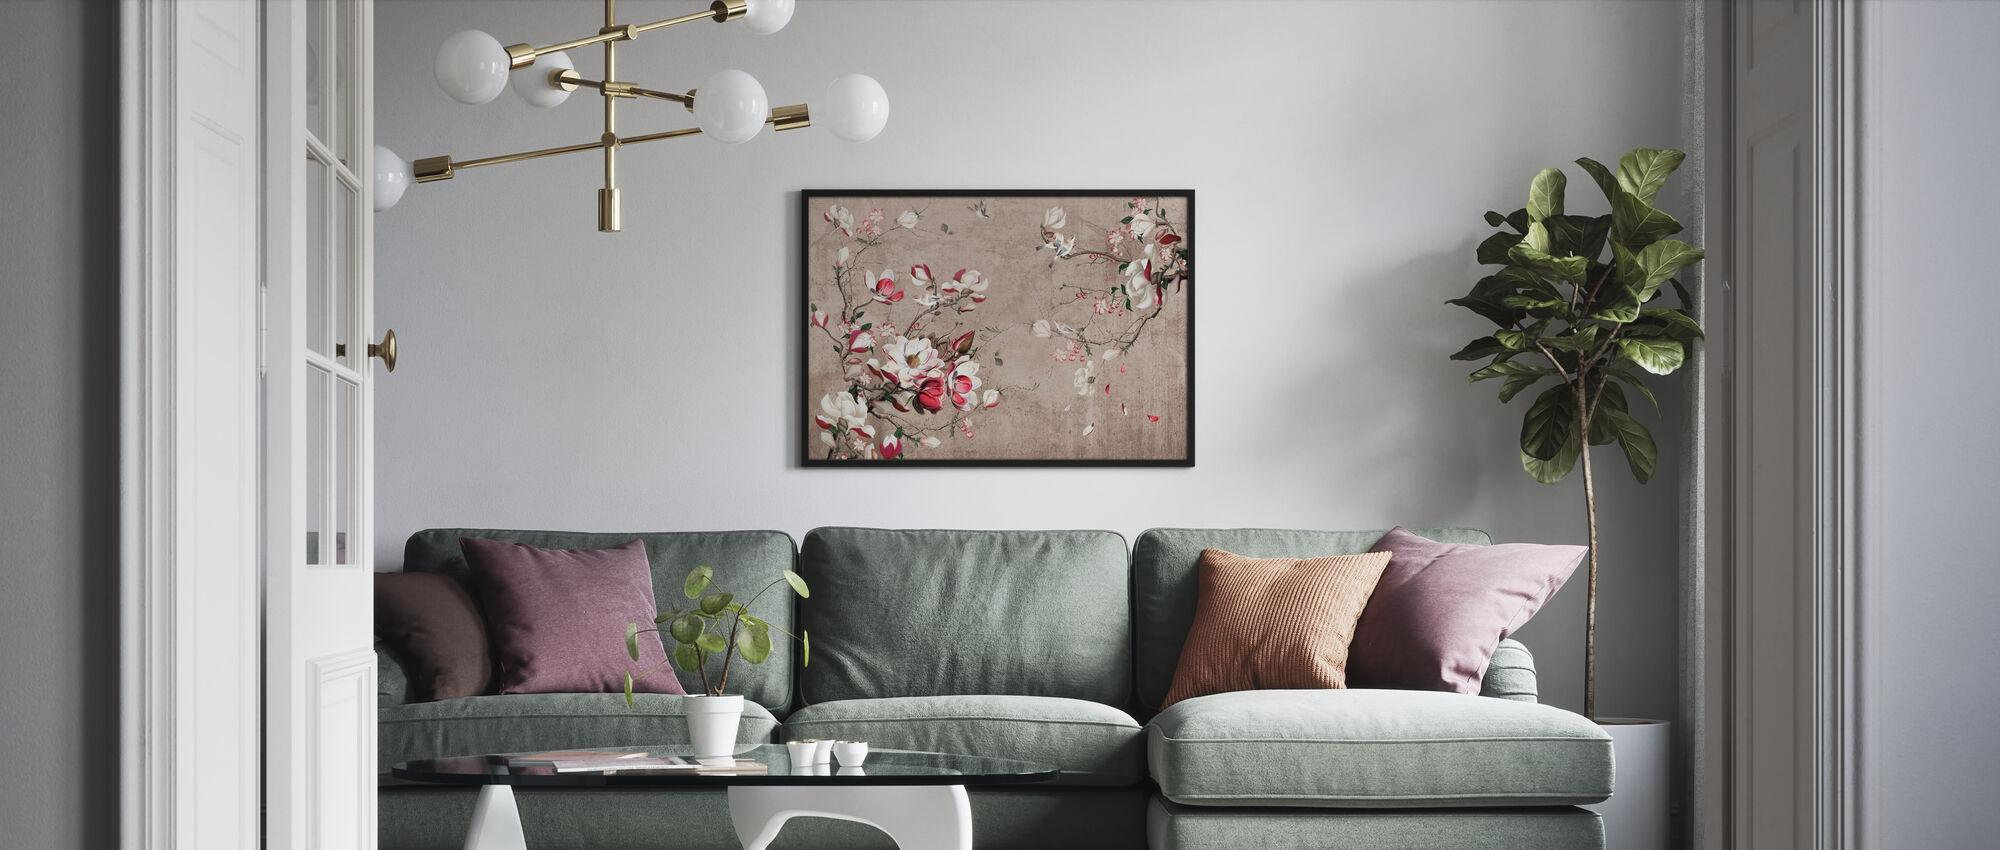 Flourish Botanical - Poster - Living Room